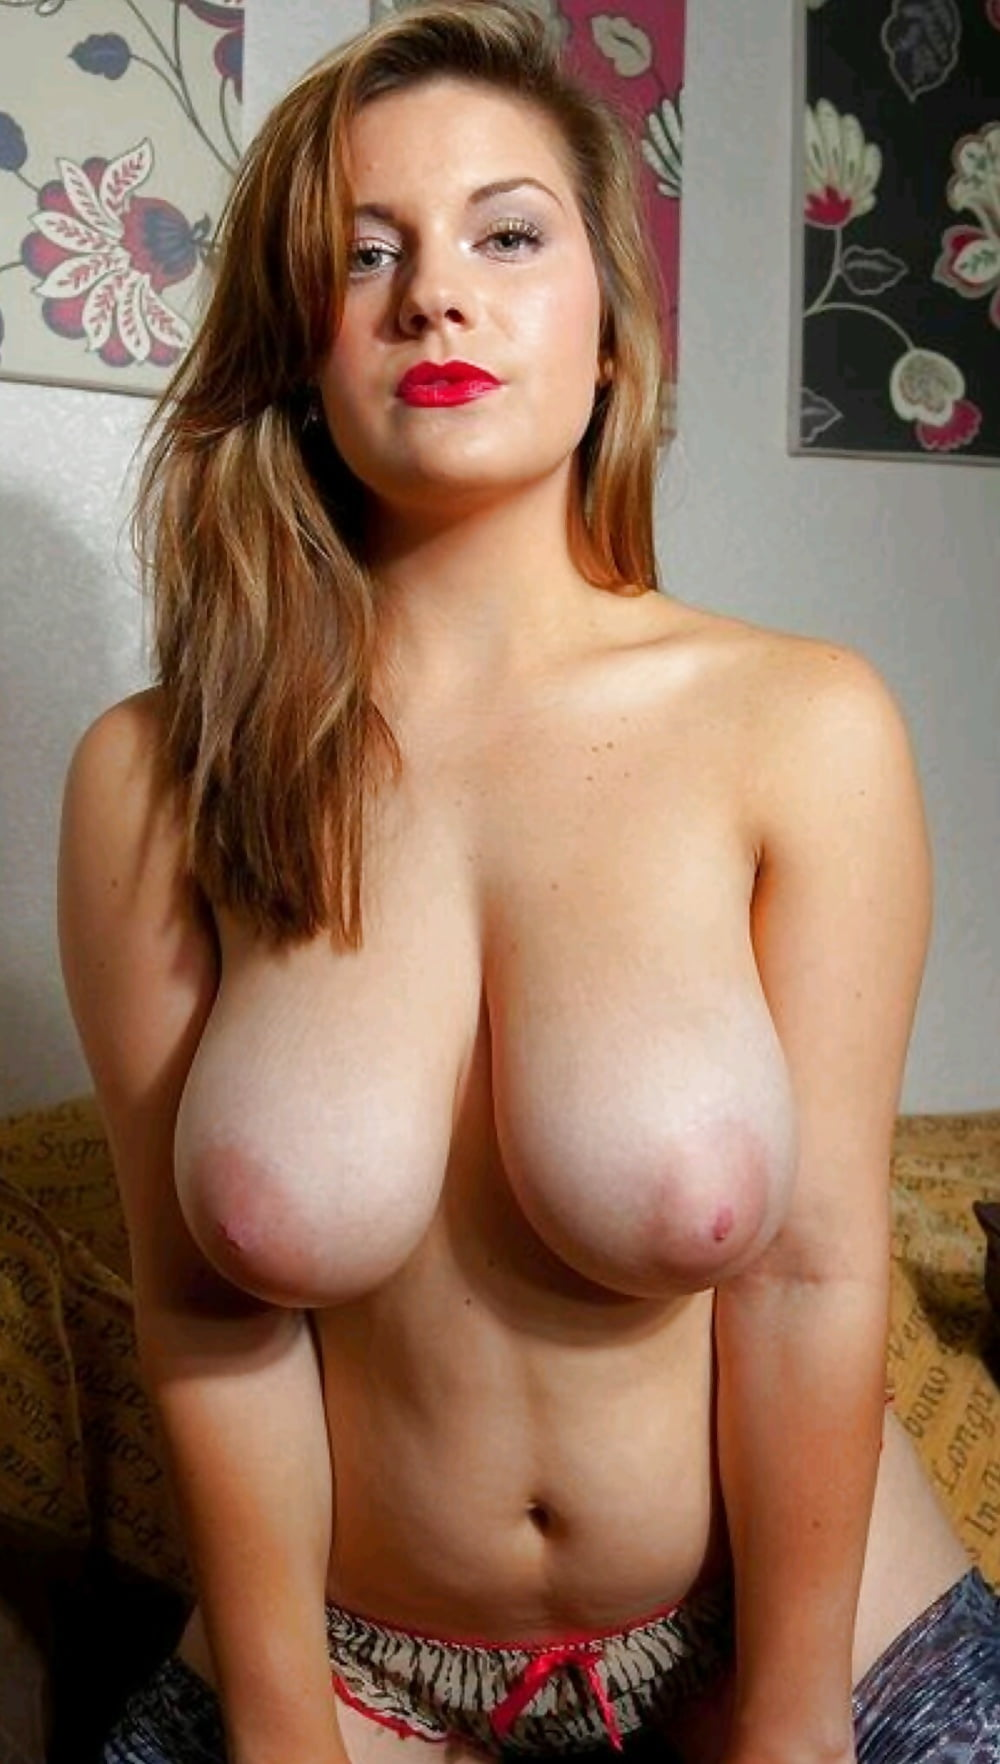 amateur-big-breasts-natural-gallery